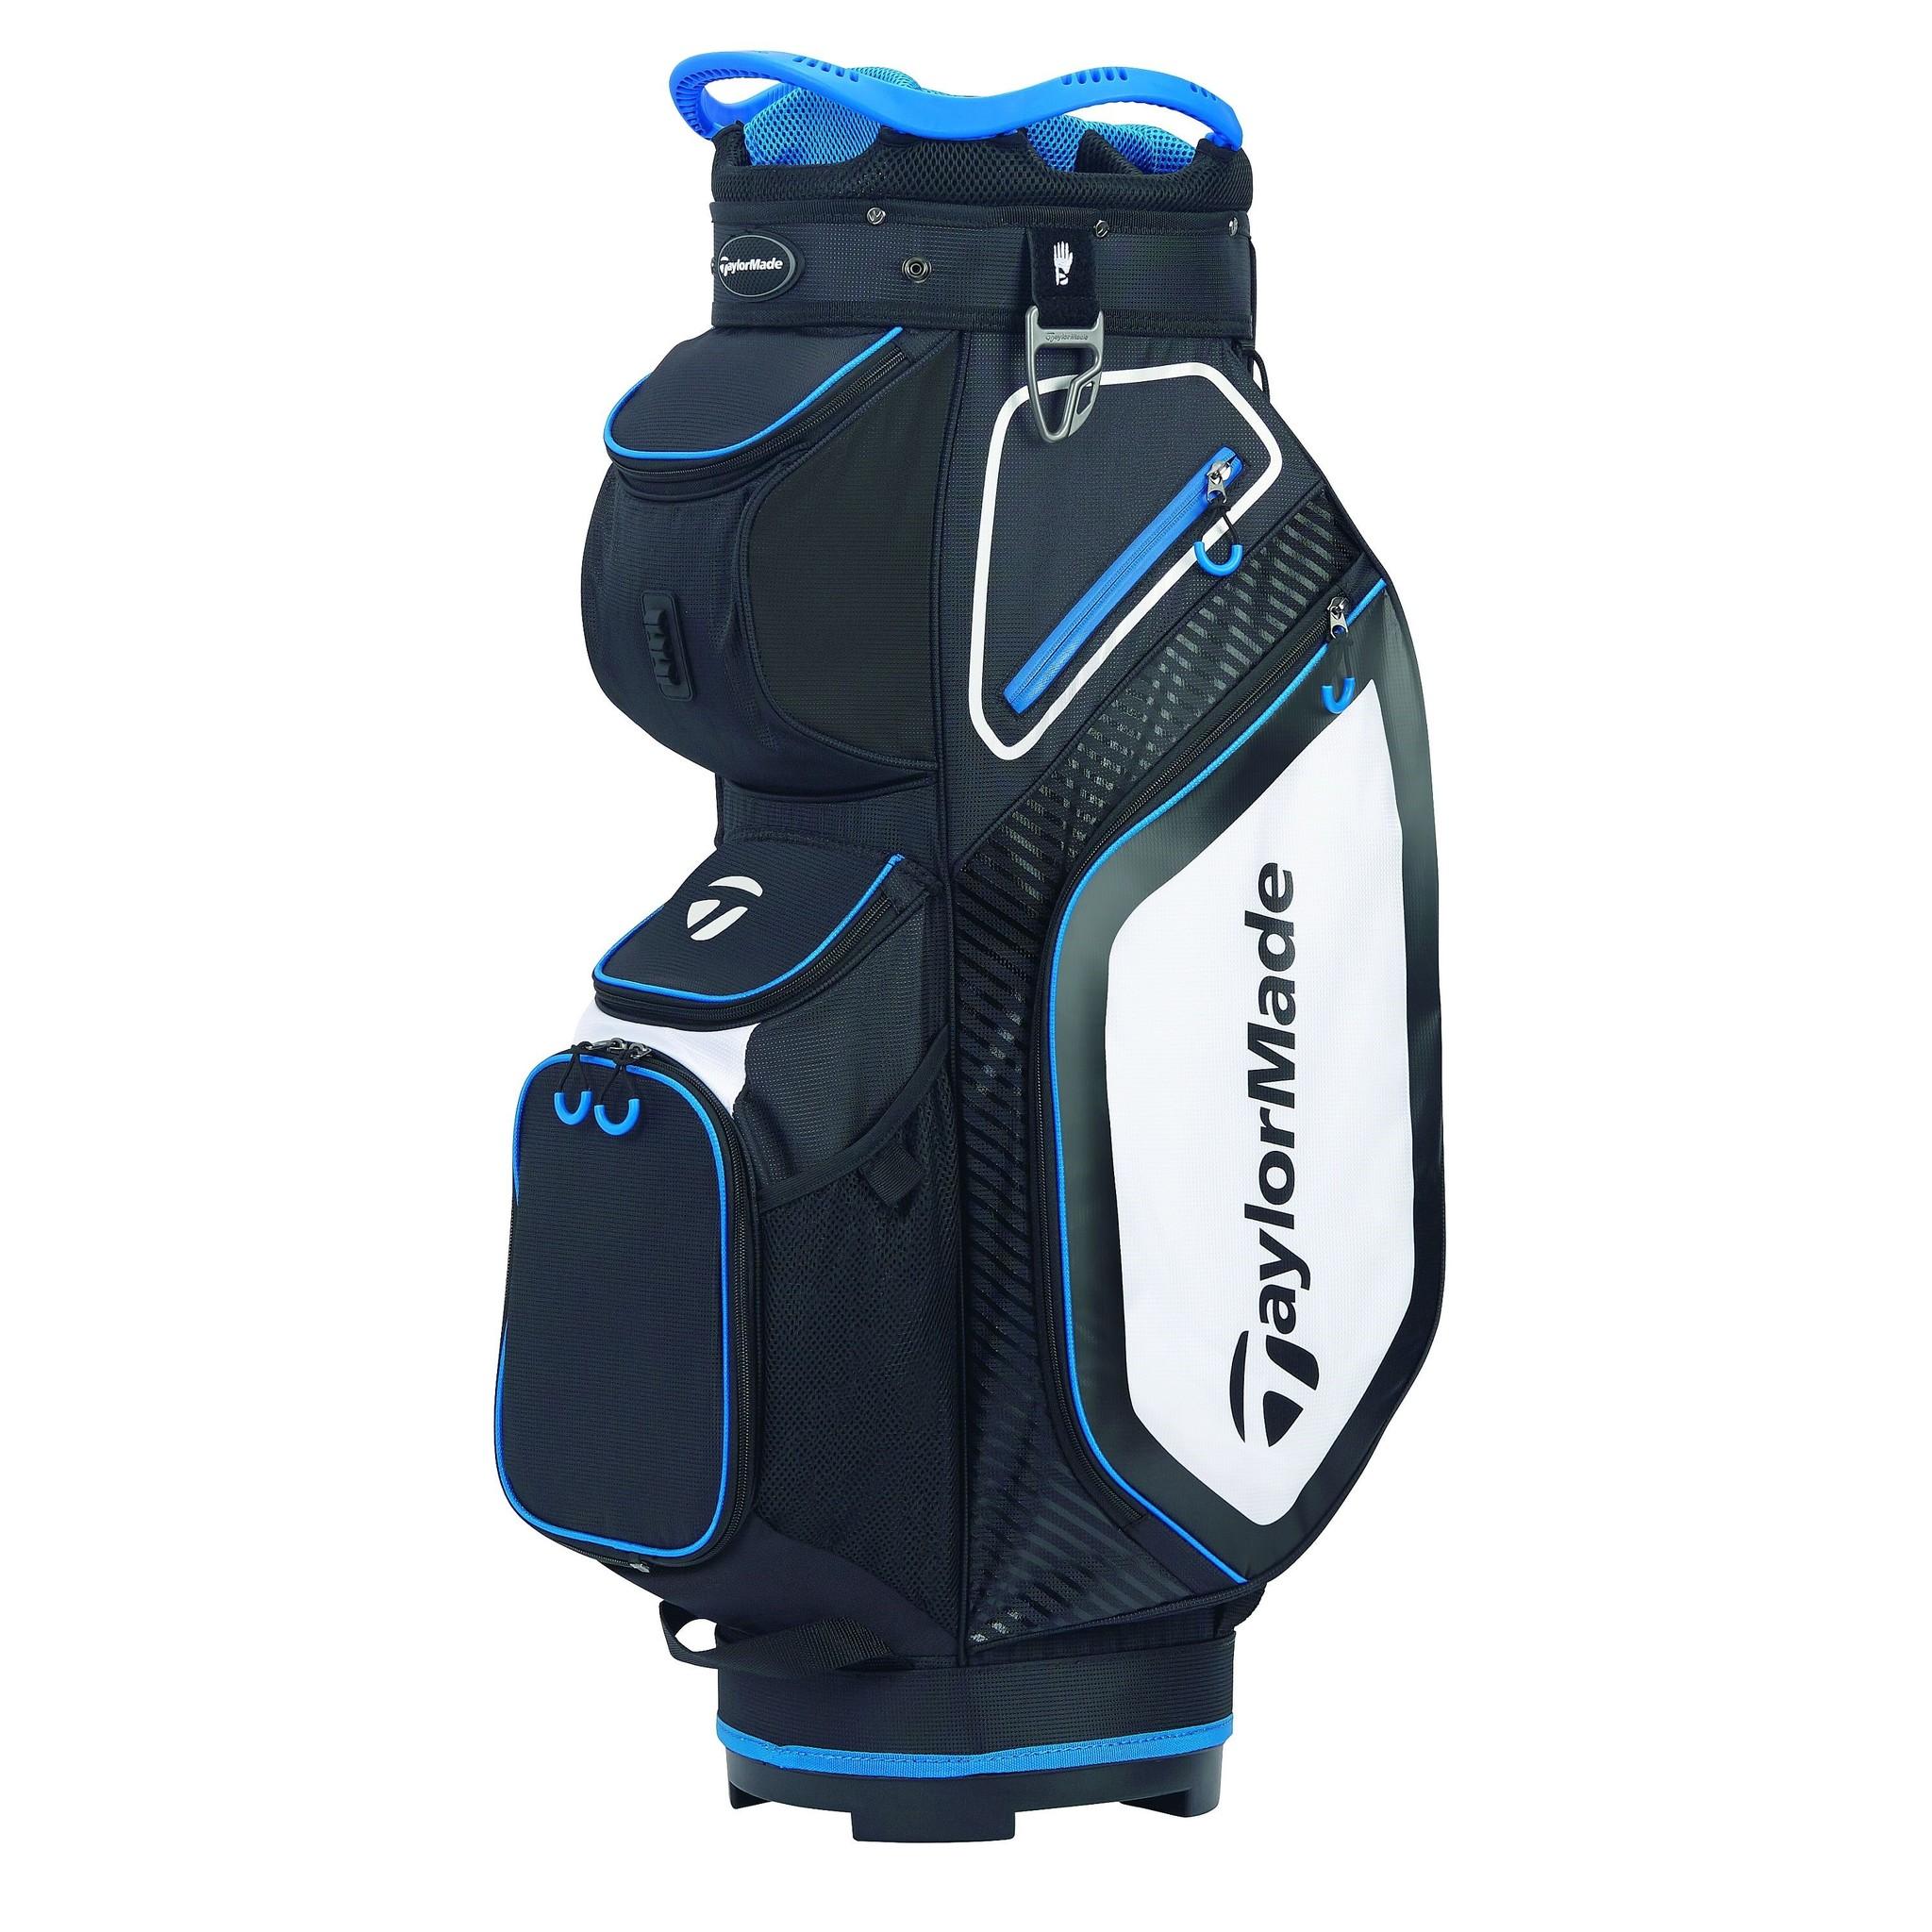 TaylorMade Pro Cart 8.0 Golf Trolley tas - Zwart/Wit/Blauw